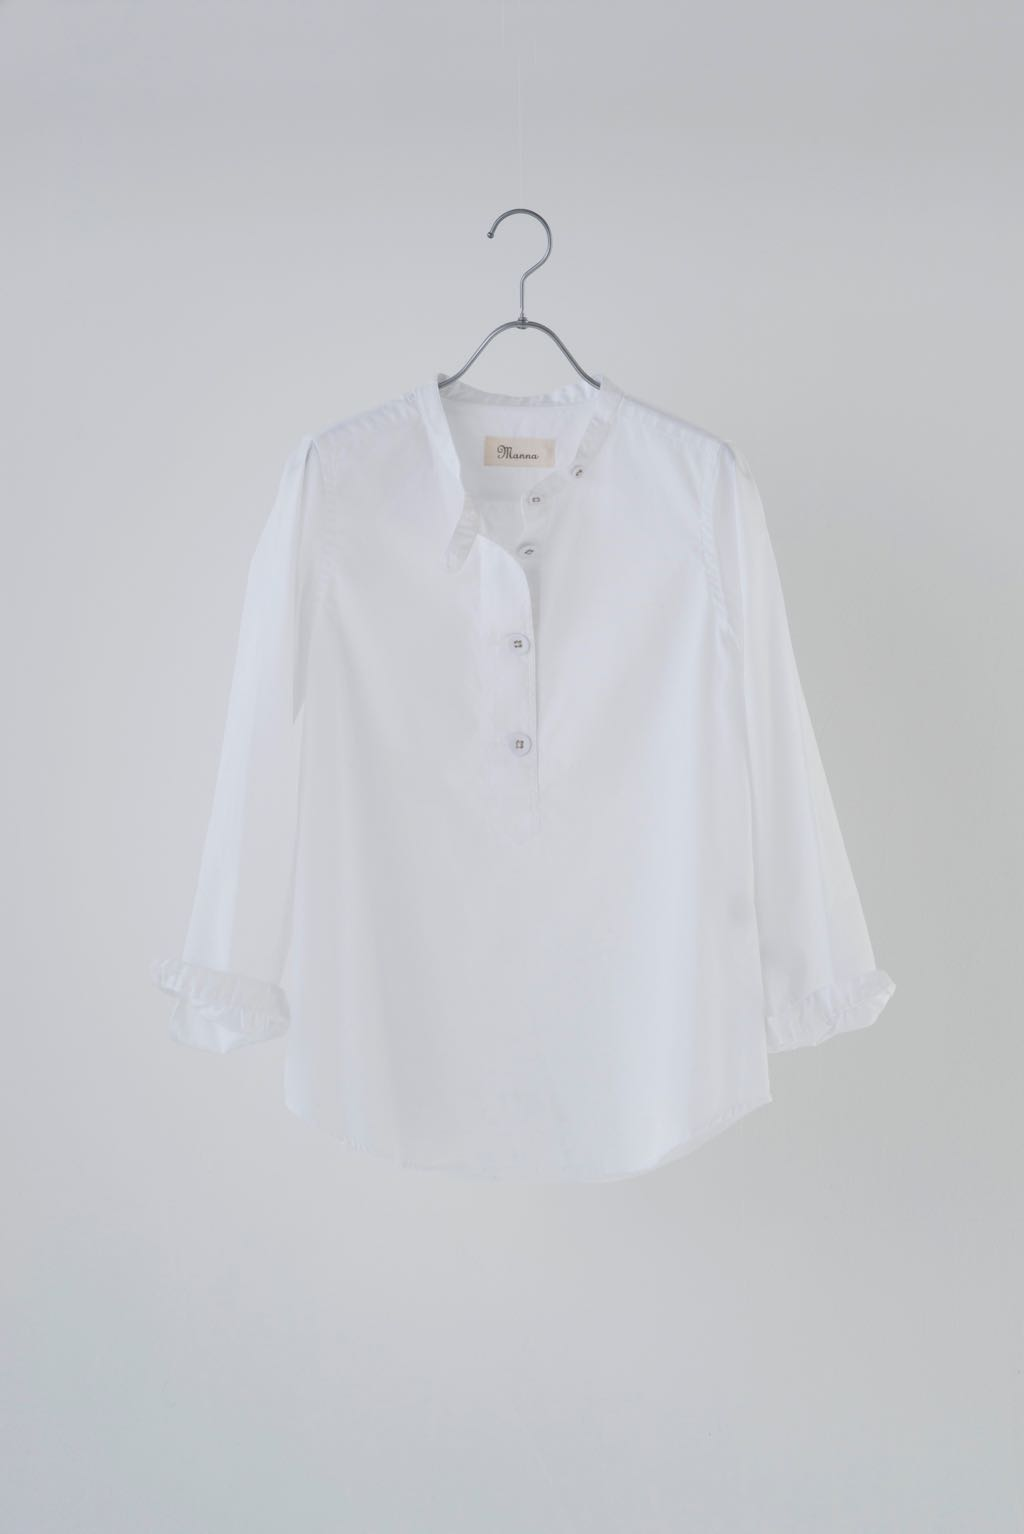 HENLY NECK SHIRT 174010 ¥15,000+tax